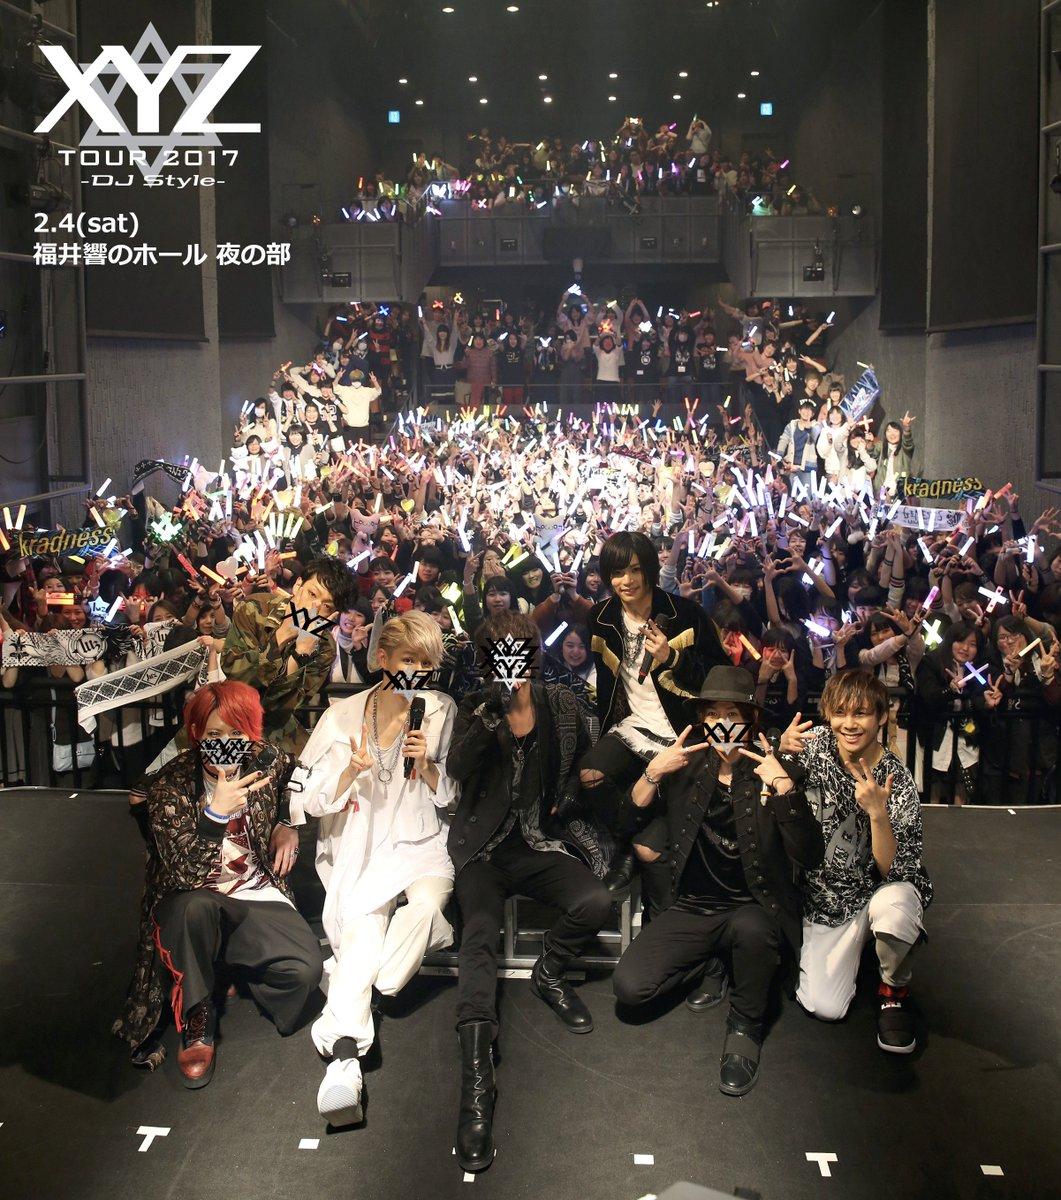 【XYZ TOUR 2017 -DJ Style-@福井公演 夜の部終了!】ご来場の皆様、ありがとう…